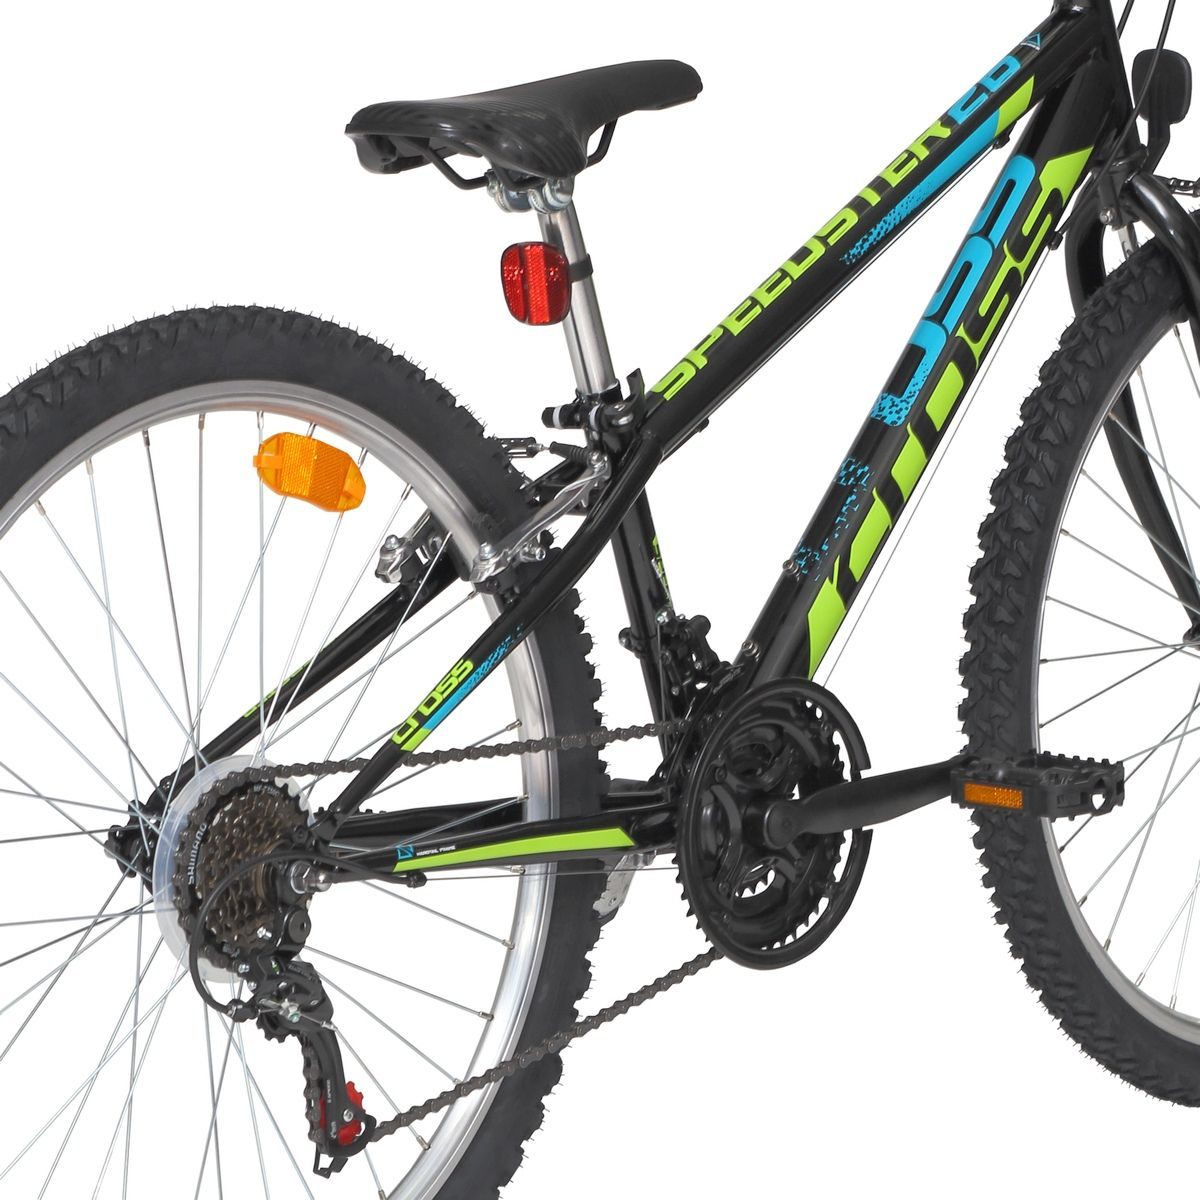 8df3ea7d7f6 store.bg - Speedster Steel 2019 - Детски велосипед 26